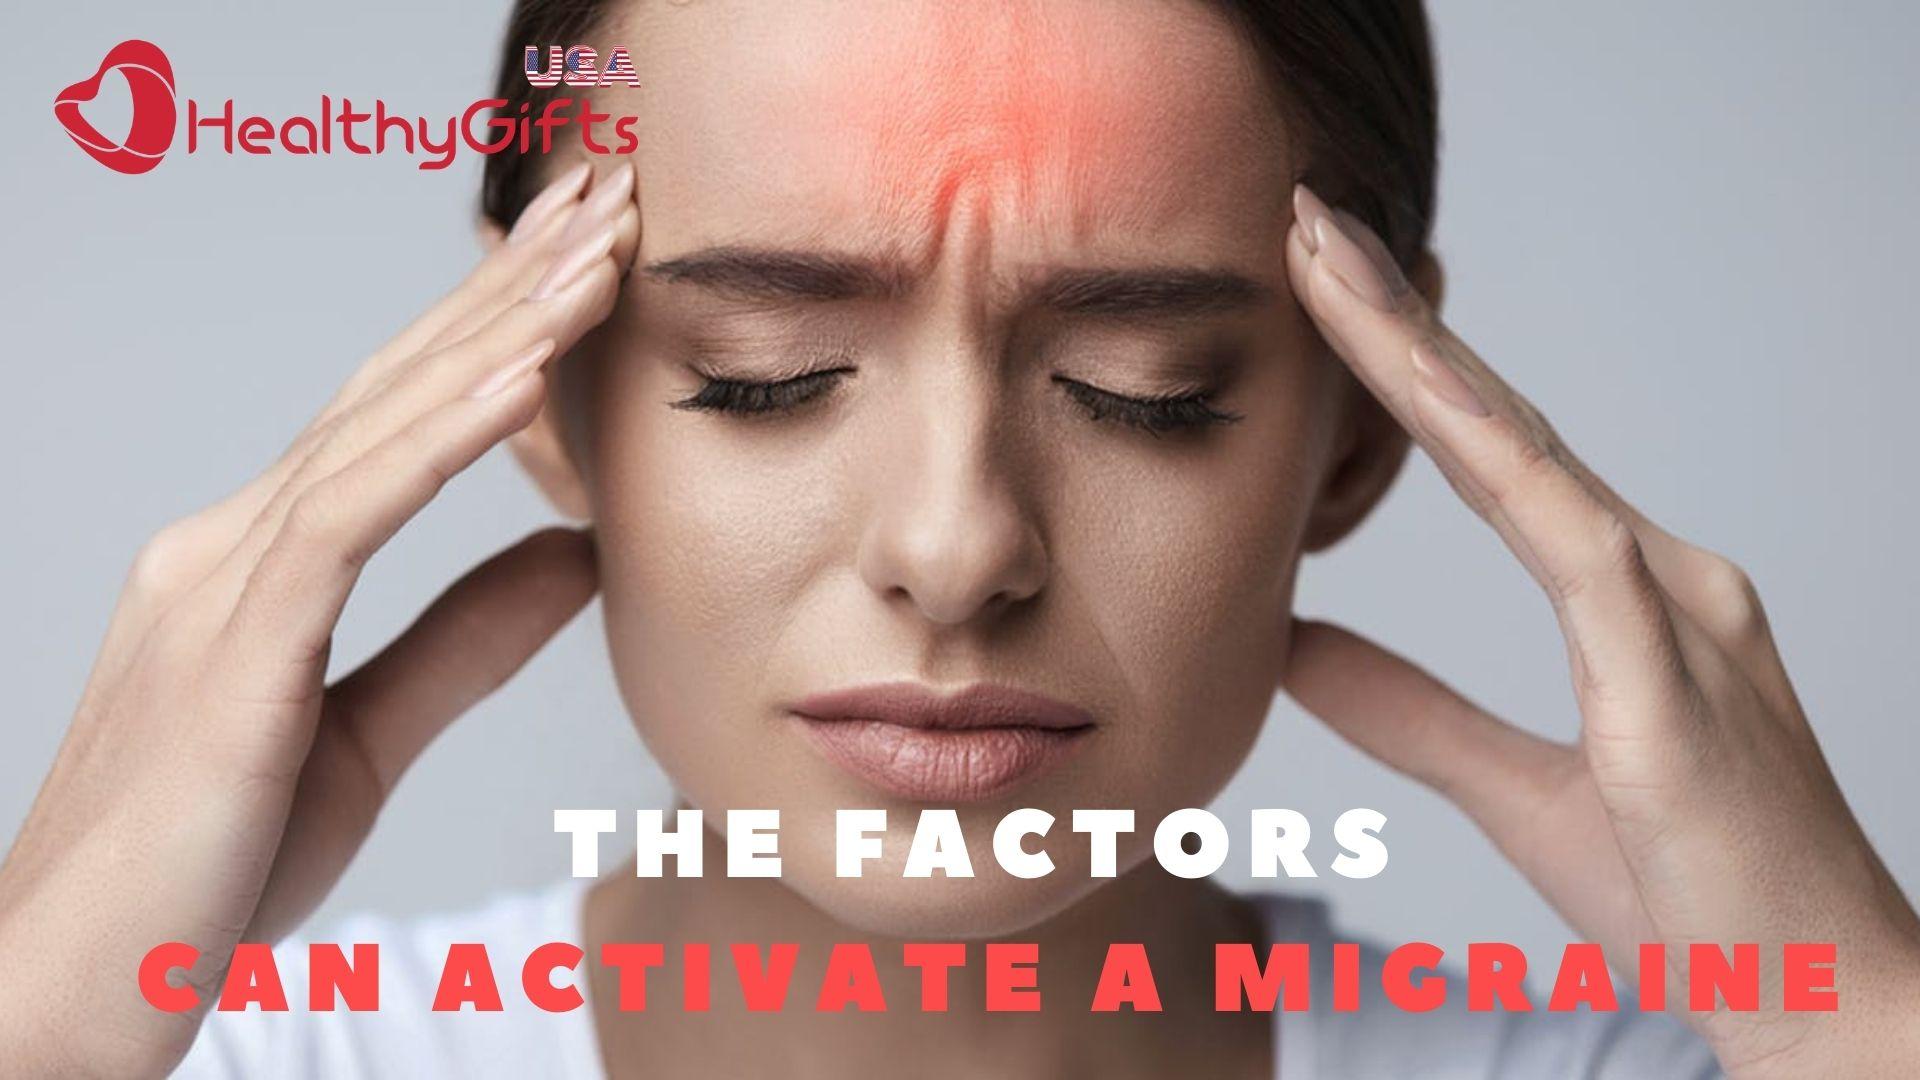 The Factors Can Activate A Migraine.